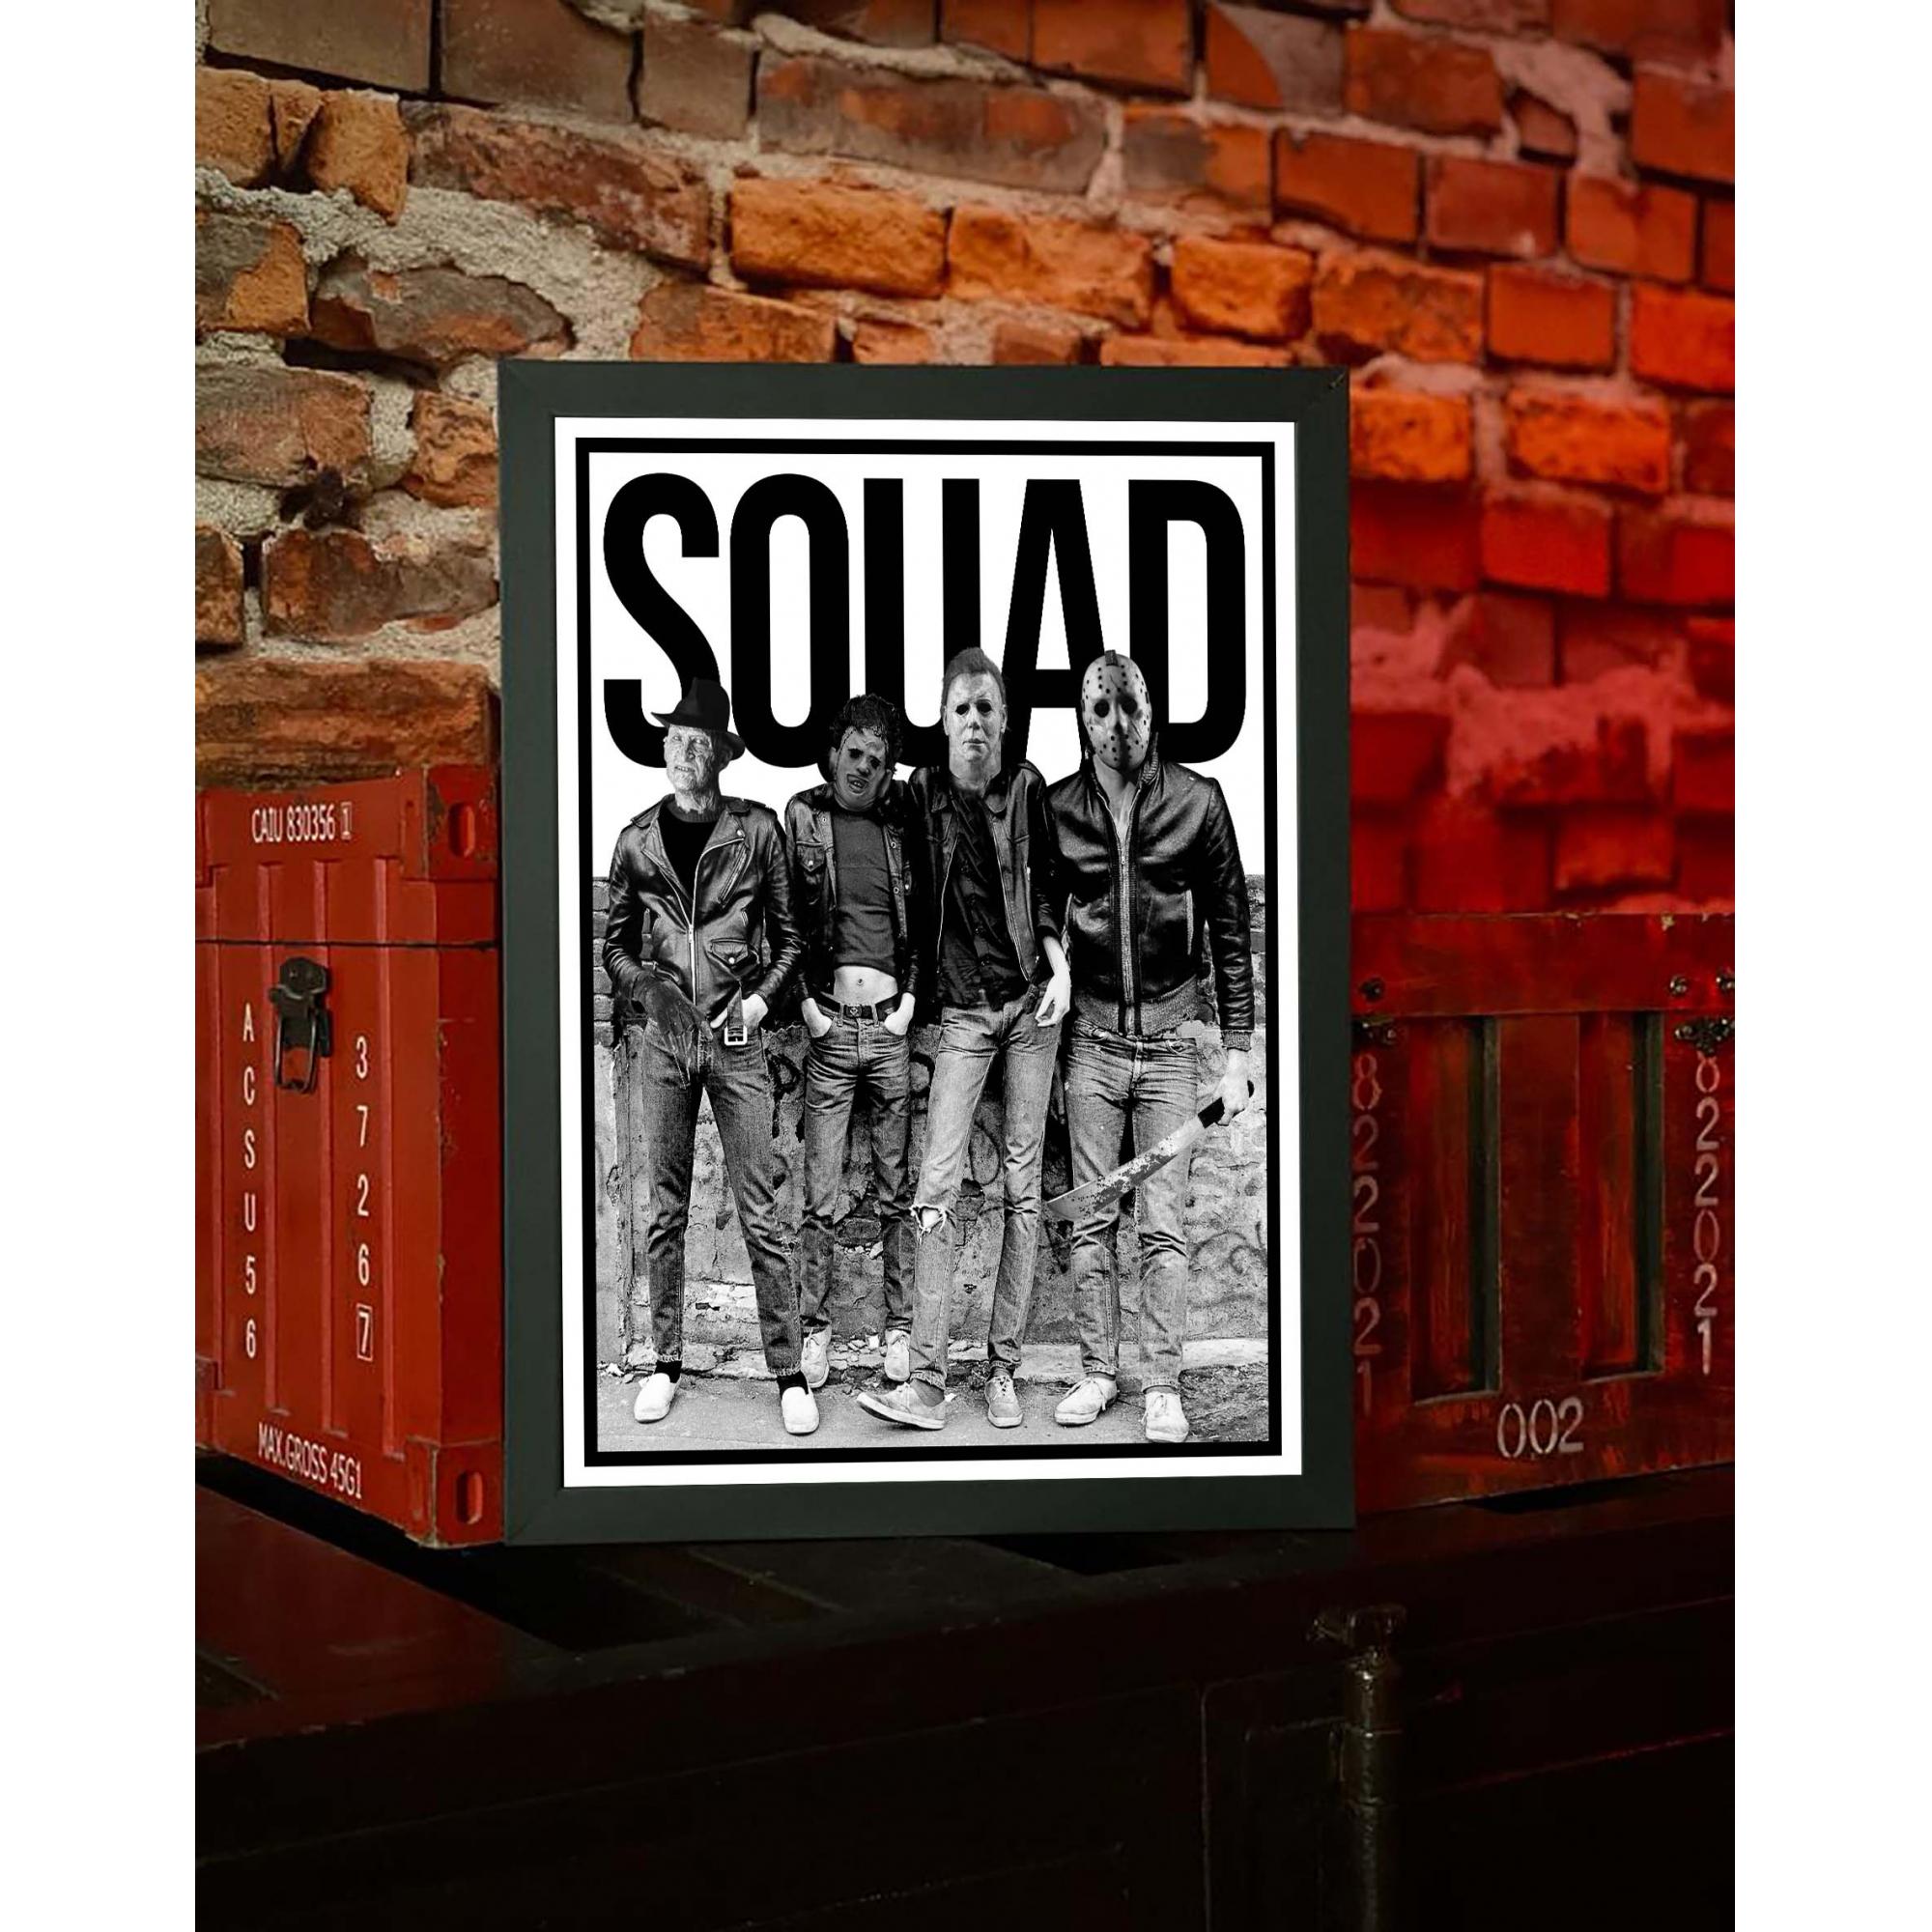 Quadro Com Moldura Squad Horror Freddy Krueger Michael Myers Leatherface Jason Voorhees Halloween Ramones - 46x33 - EV